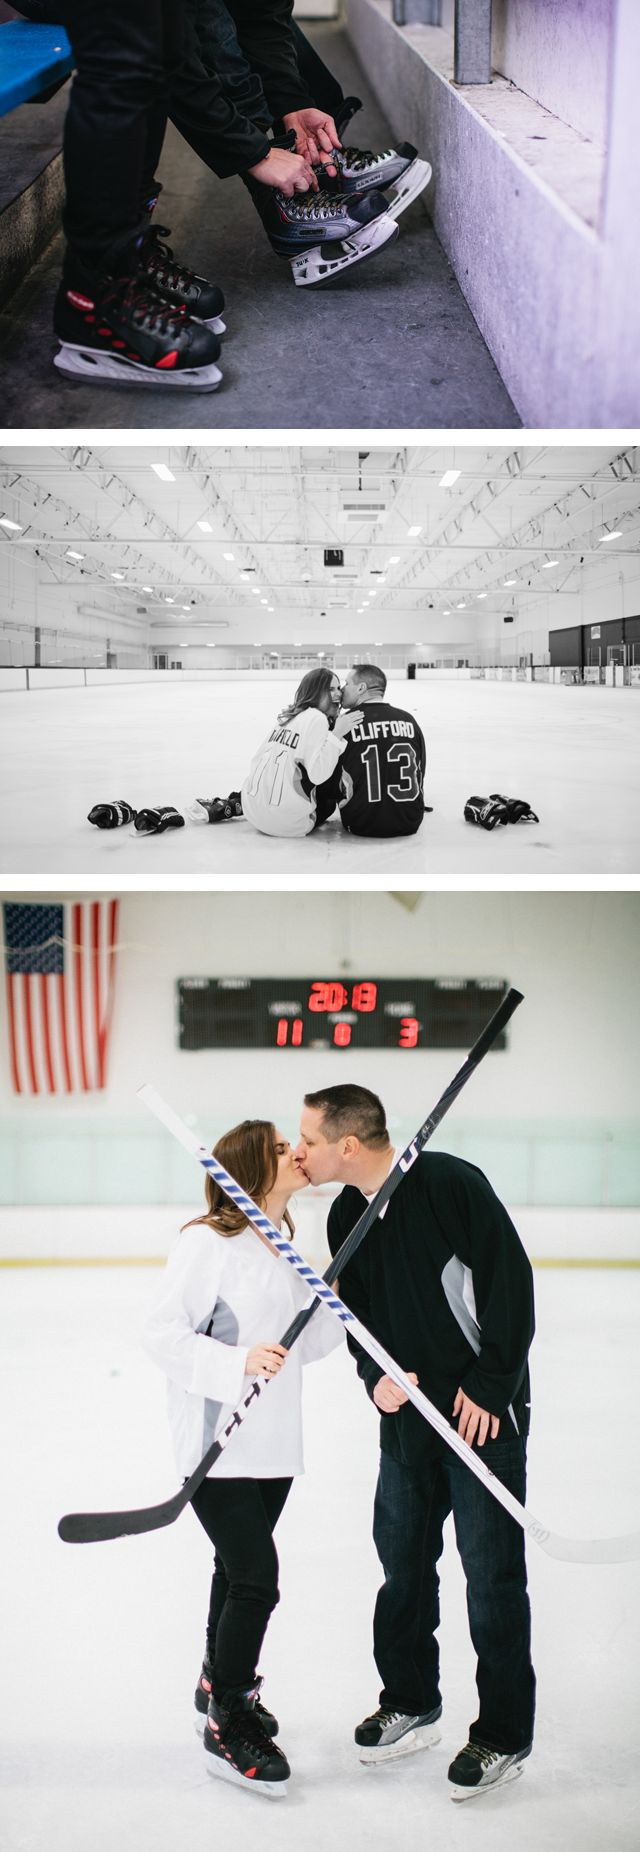 Hockey Engagement Photos Ice Rink Boston Bruins Adrian and Adnrew Meg Ruth Photo_003